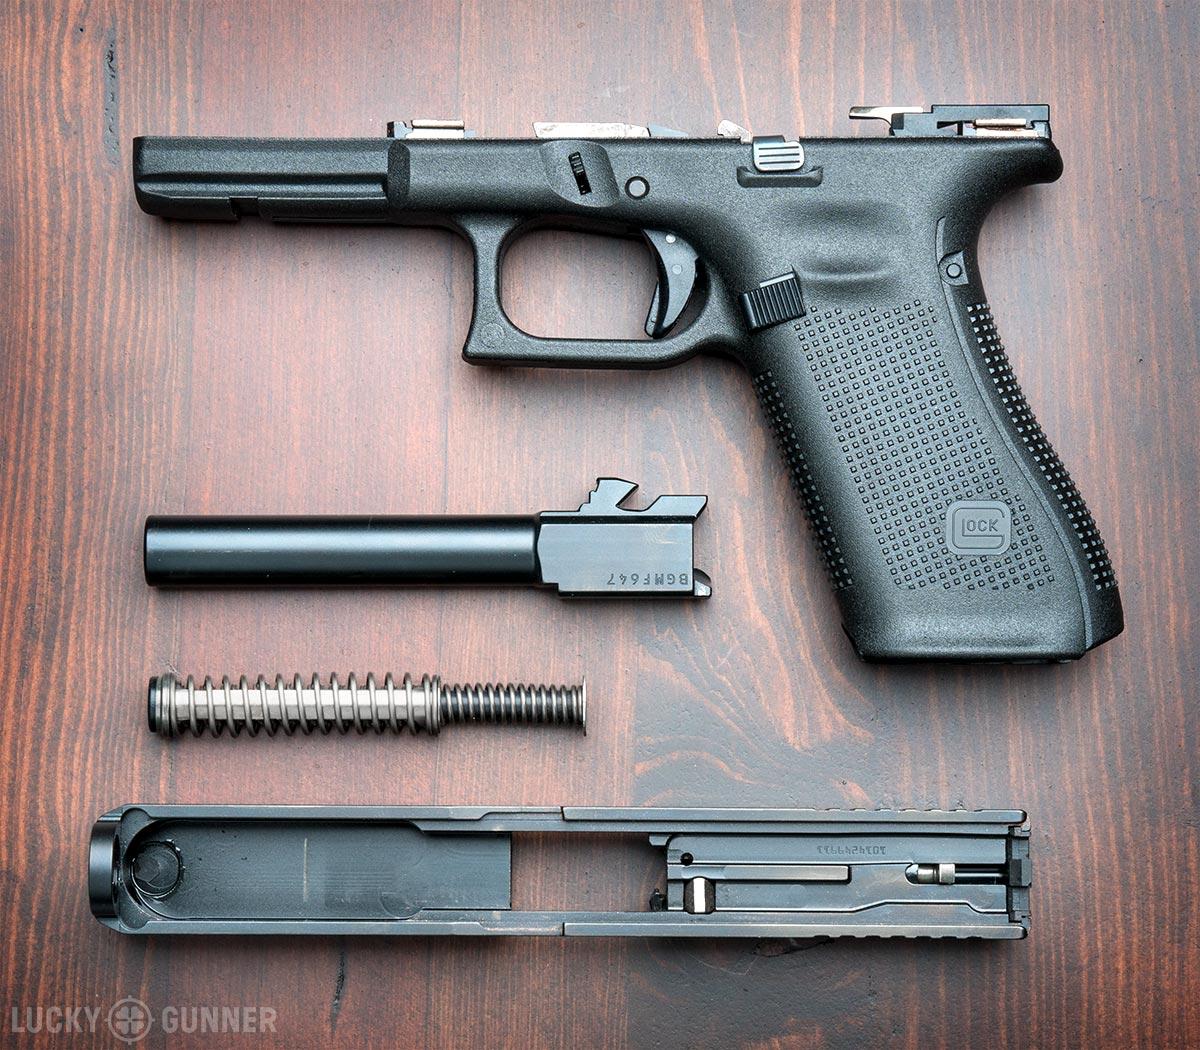 Review: The Glock 17M Duty Pistol - Lucky Gunner Lounge